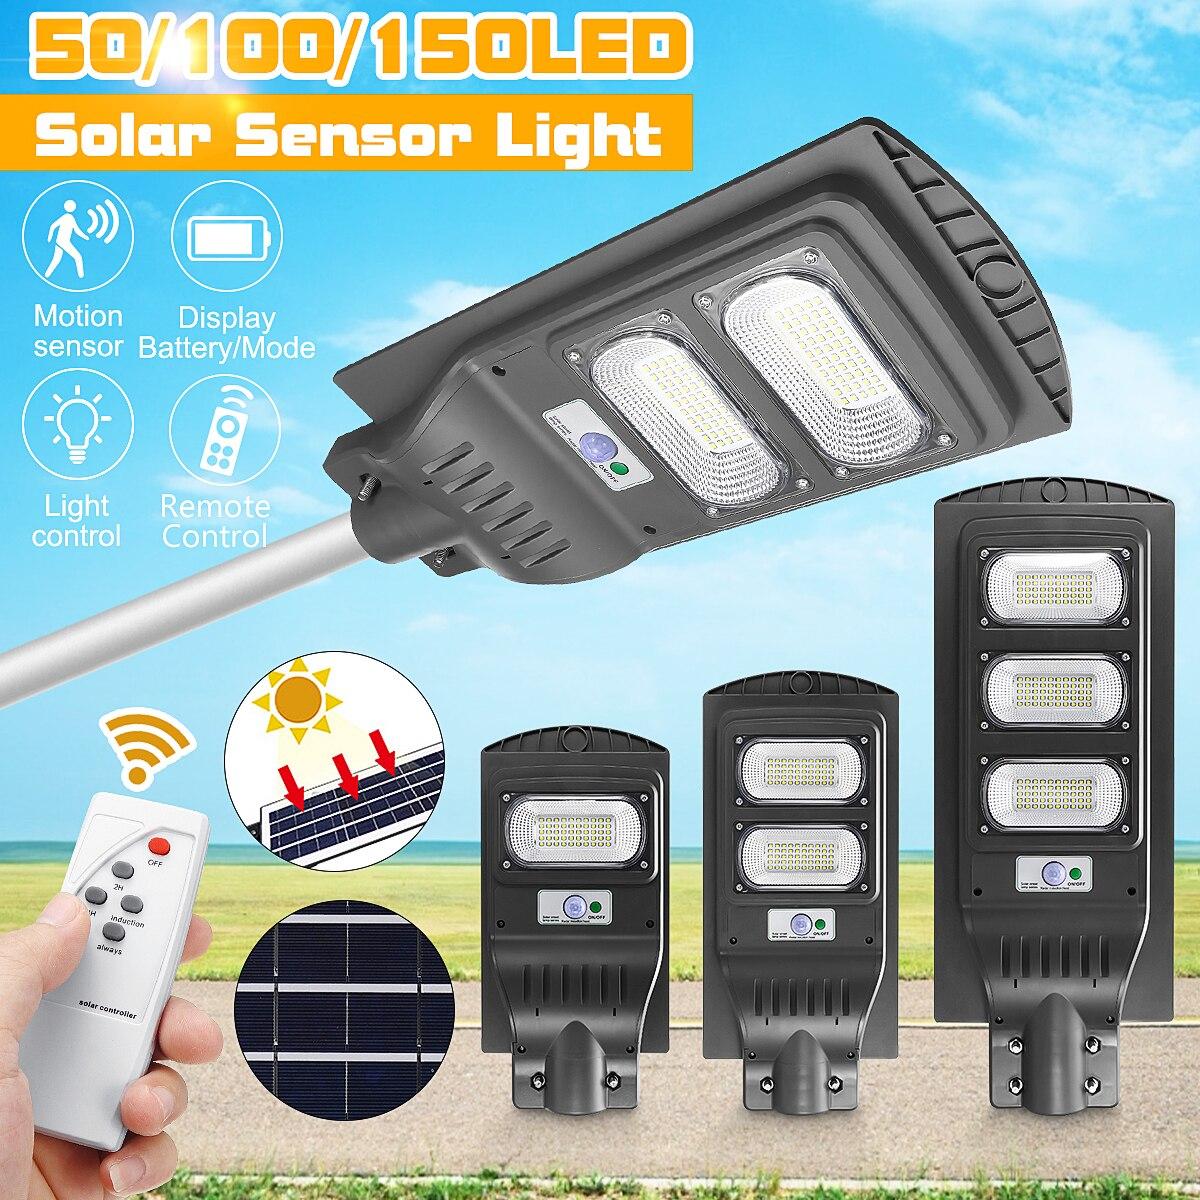 60/90/150W LED Wall Lamp IP65 Solar Street Light Radar Motion 2 In 1 Constantly Bright & Induction Solar Sensor Remote Control